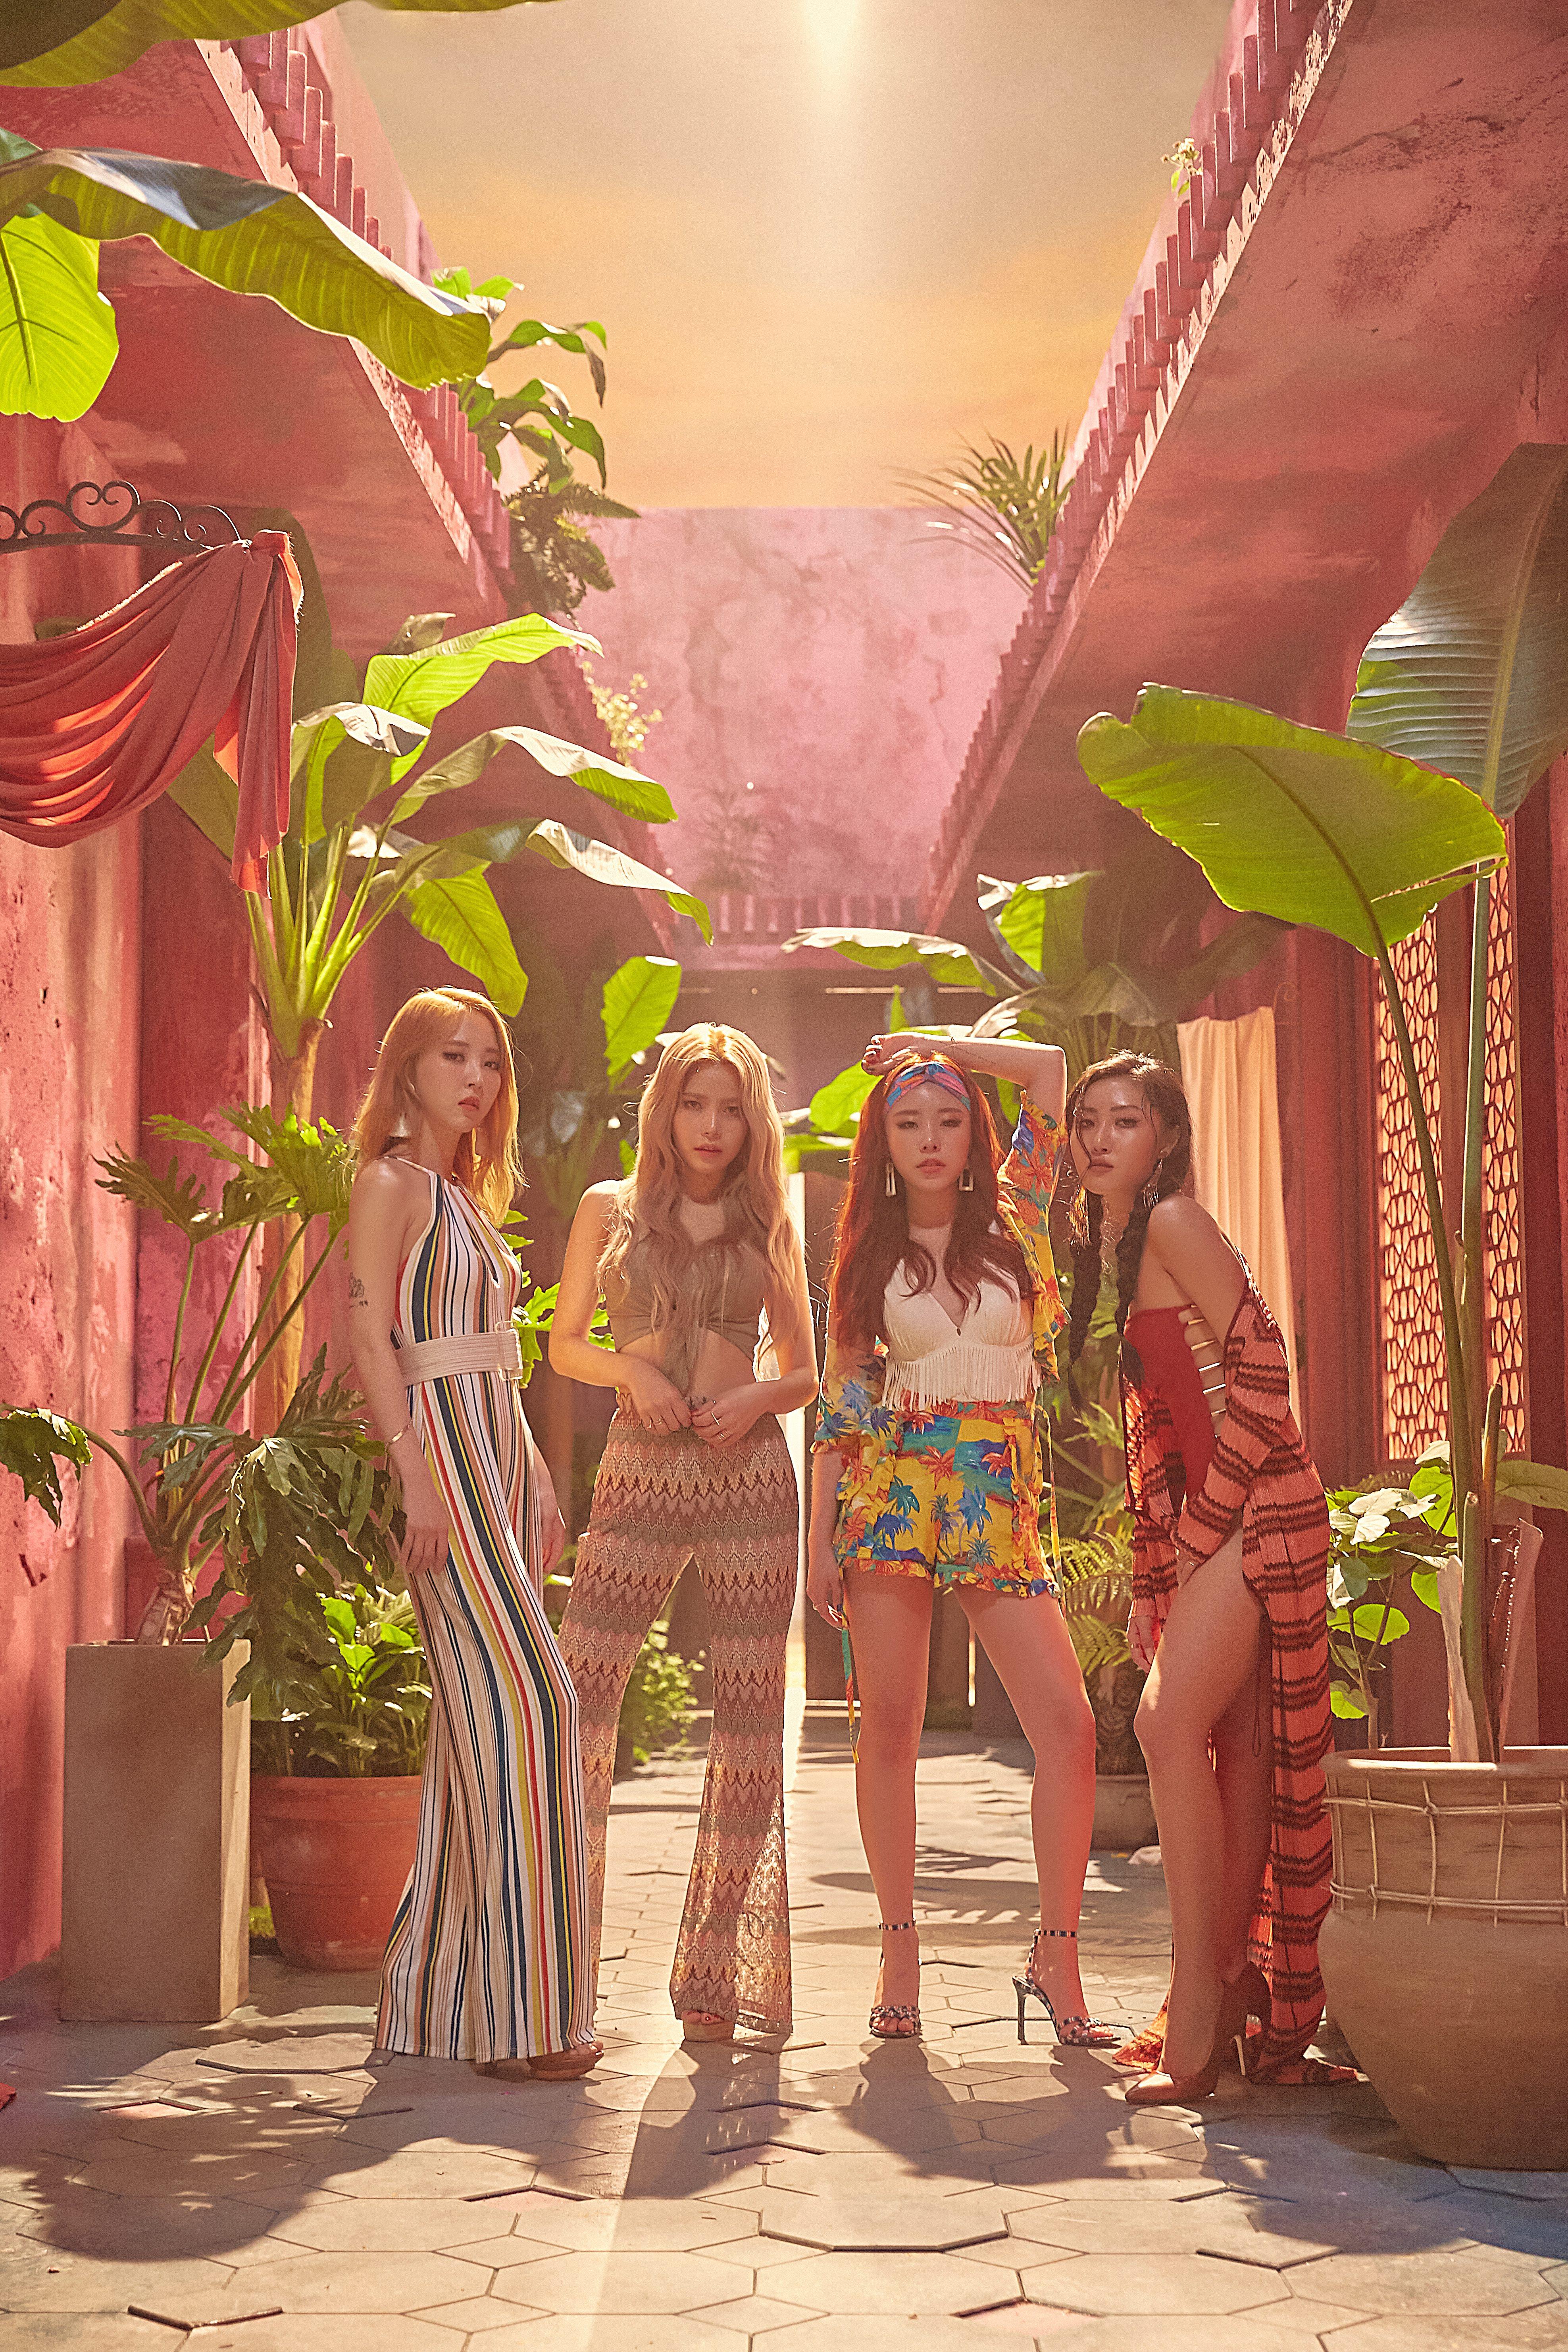 Girl Generation 2014 Wallpaper Mamamoo Red Moon Egotistic Concept Photos Hd K Pop